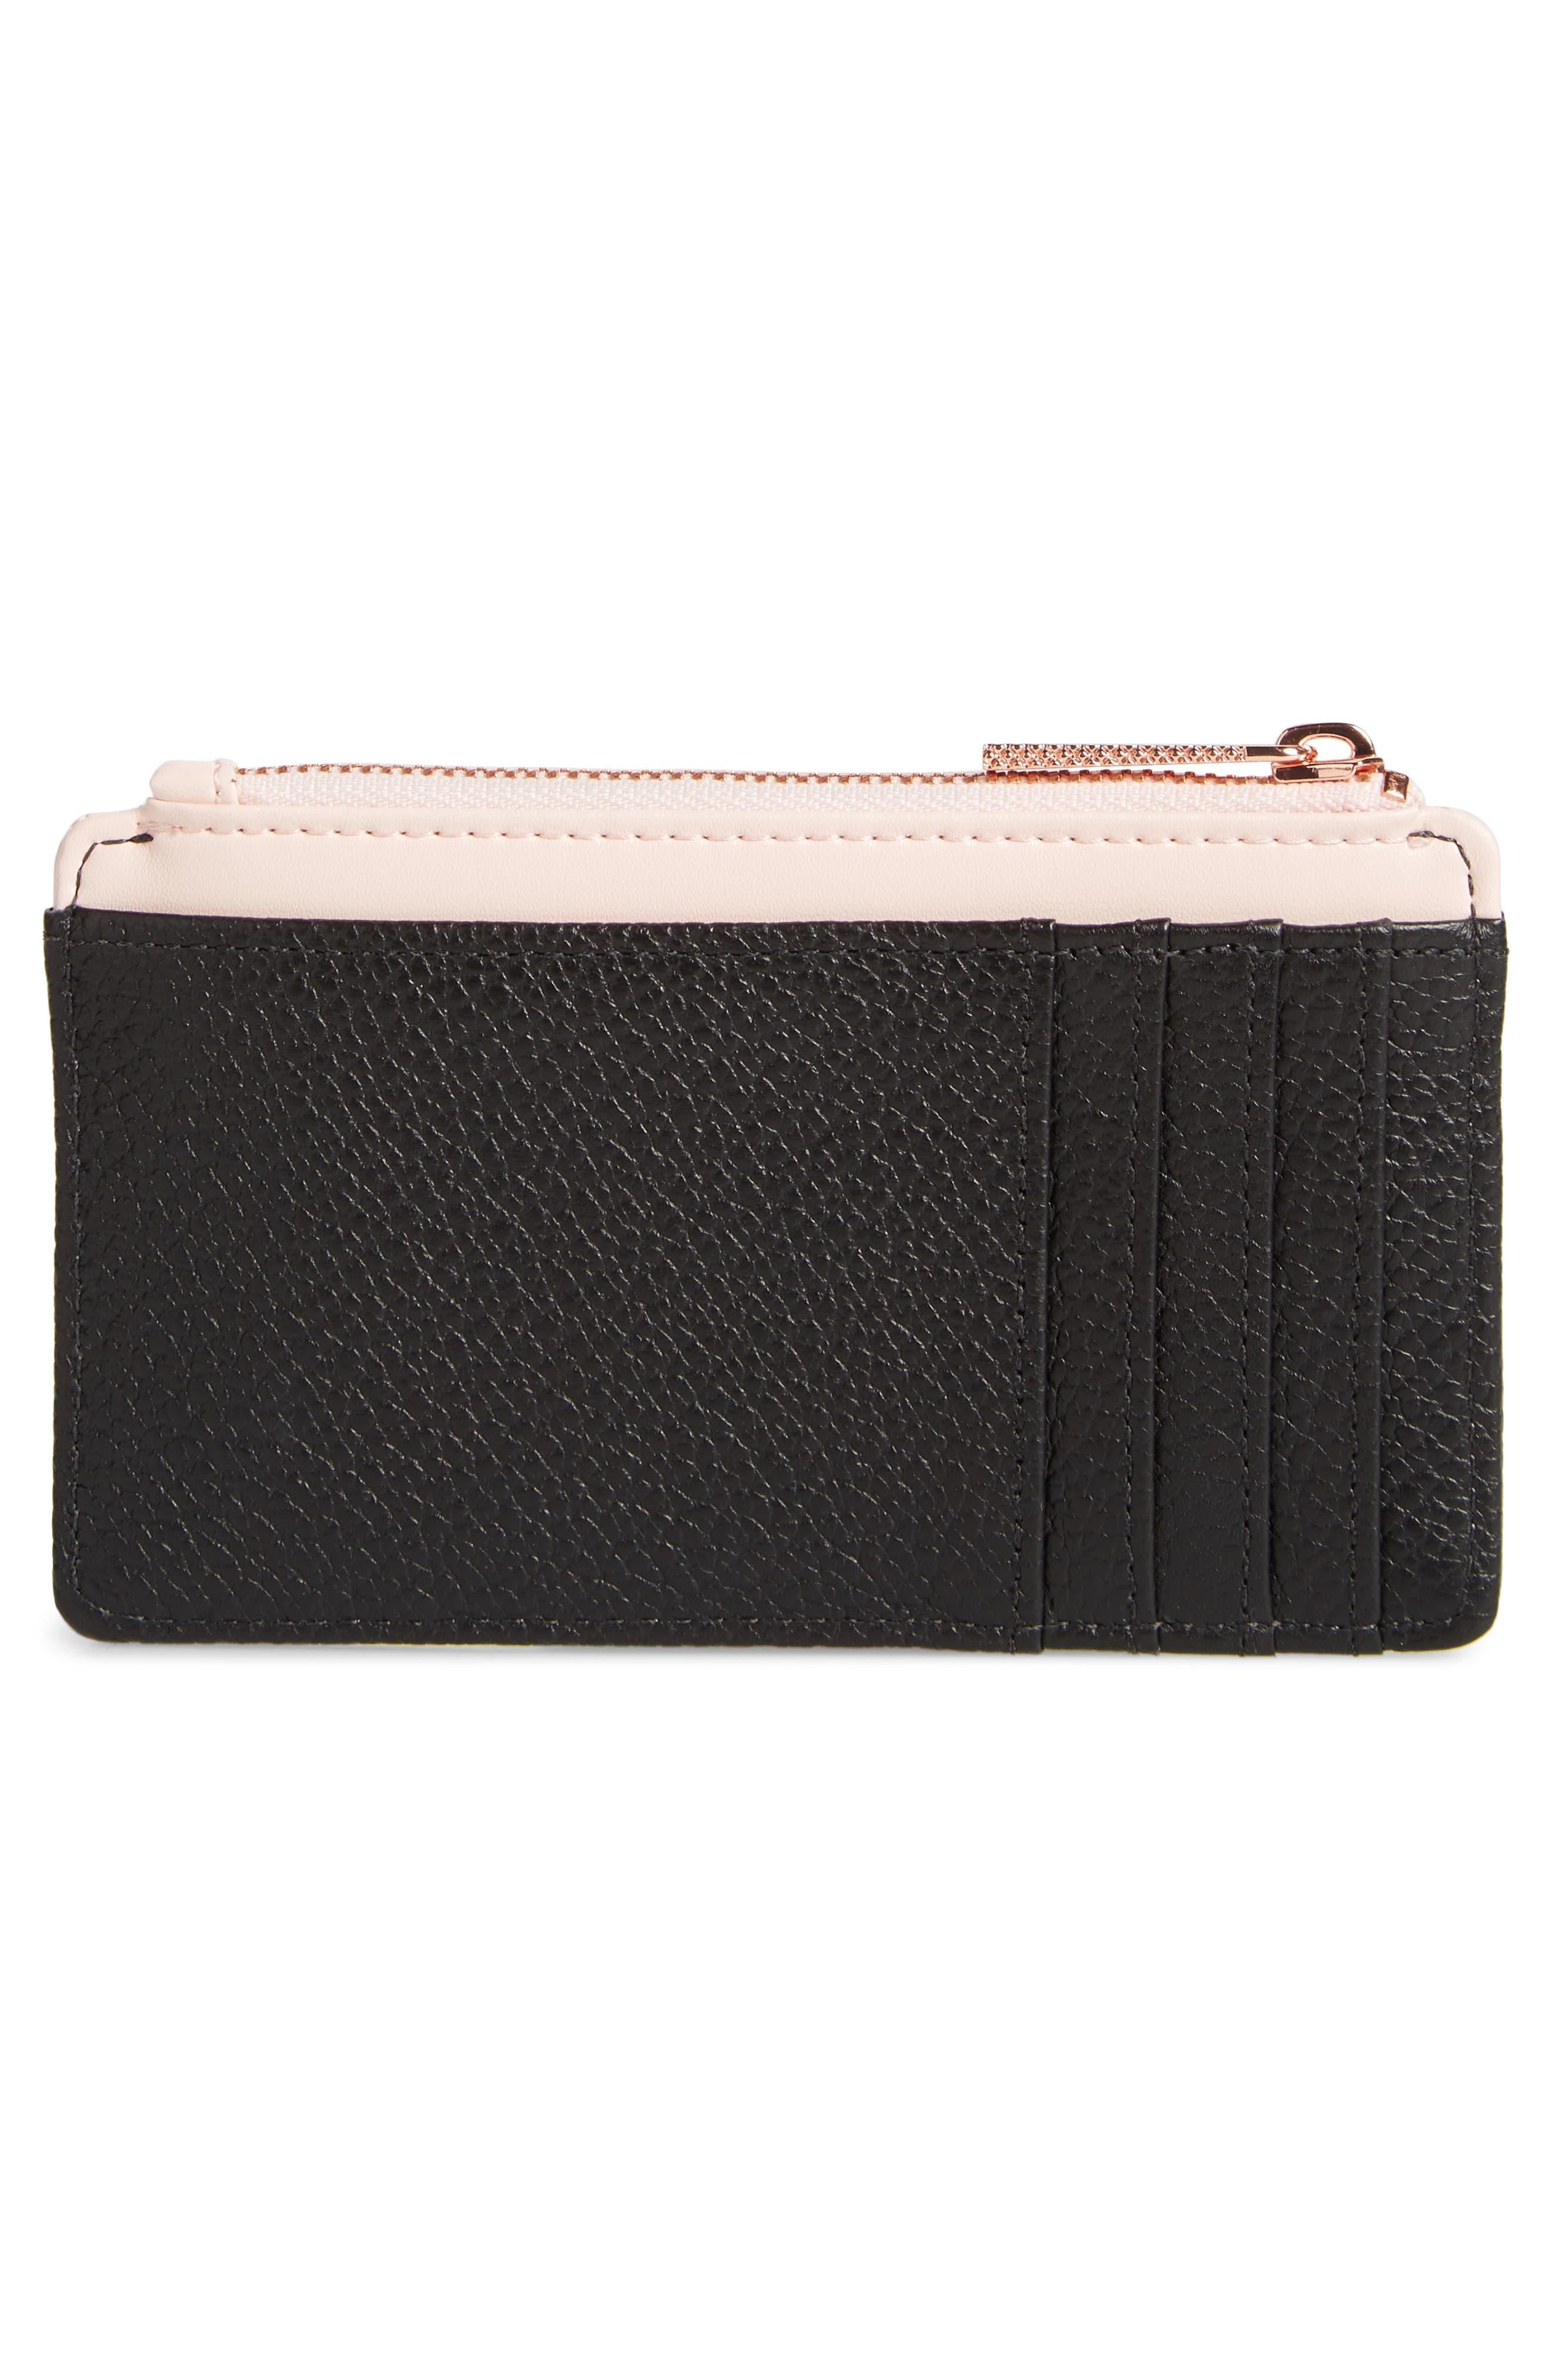 Alica Top Zip Leather Card Case,                             Alternate thumbnail 4, color,                             Black